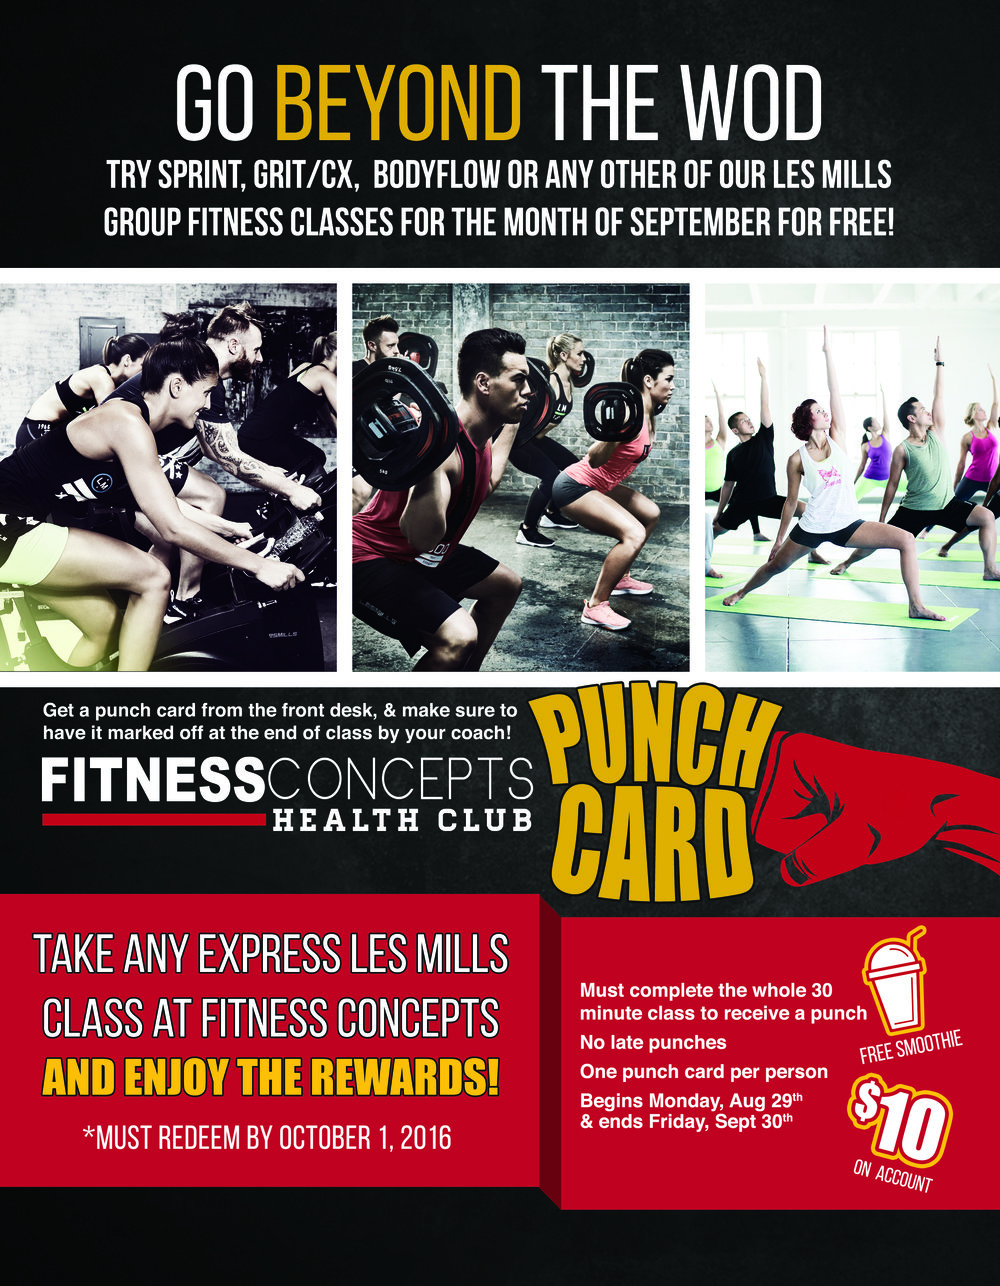 crossfit_promo_punch_card_flyer2.jpg